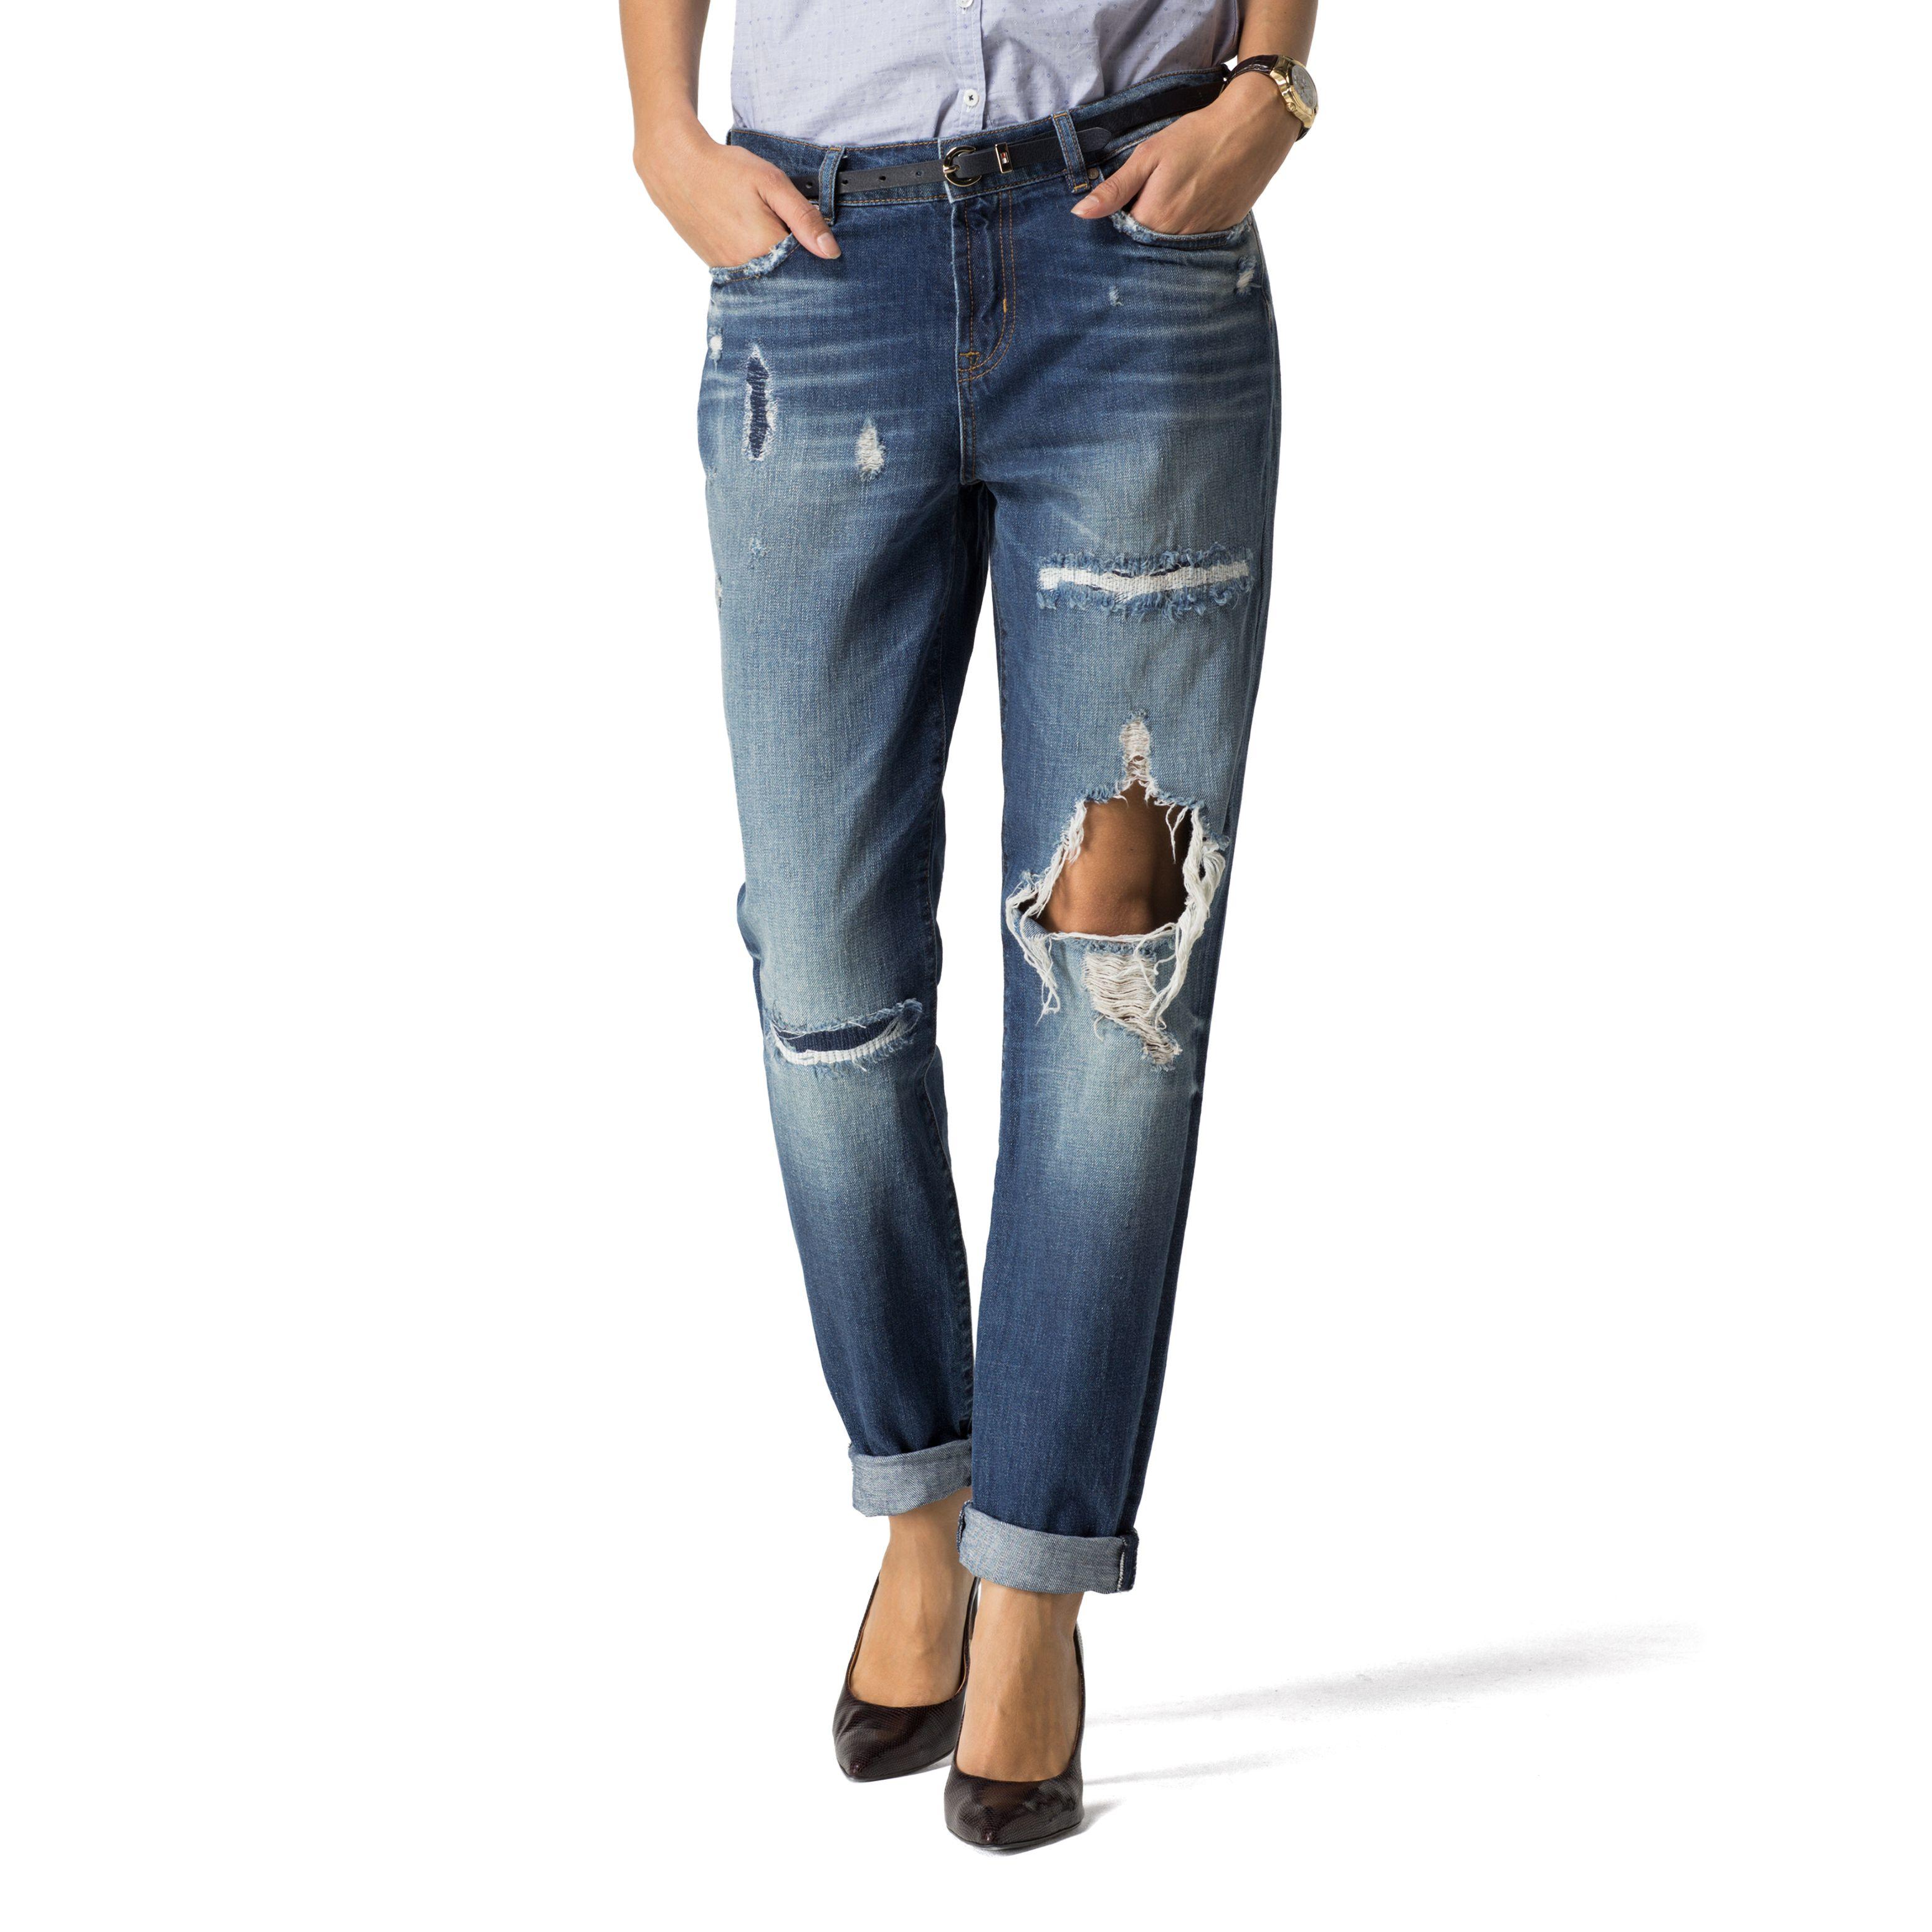 027e8a7de tommy hilfiger suzzy slim fit jeans | AmericanMedSupply.com